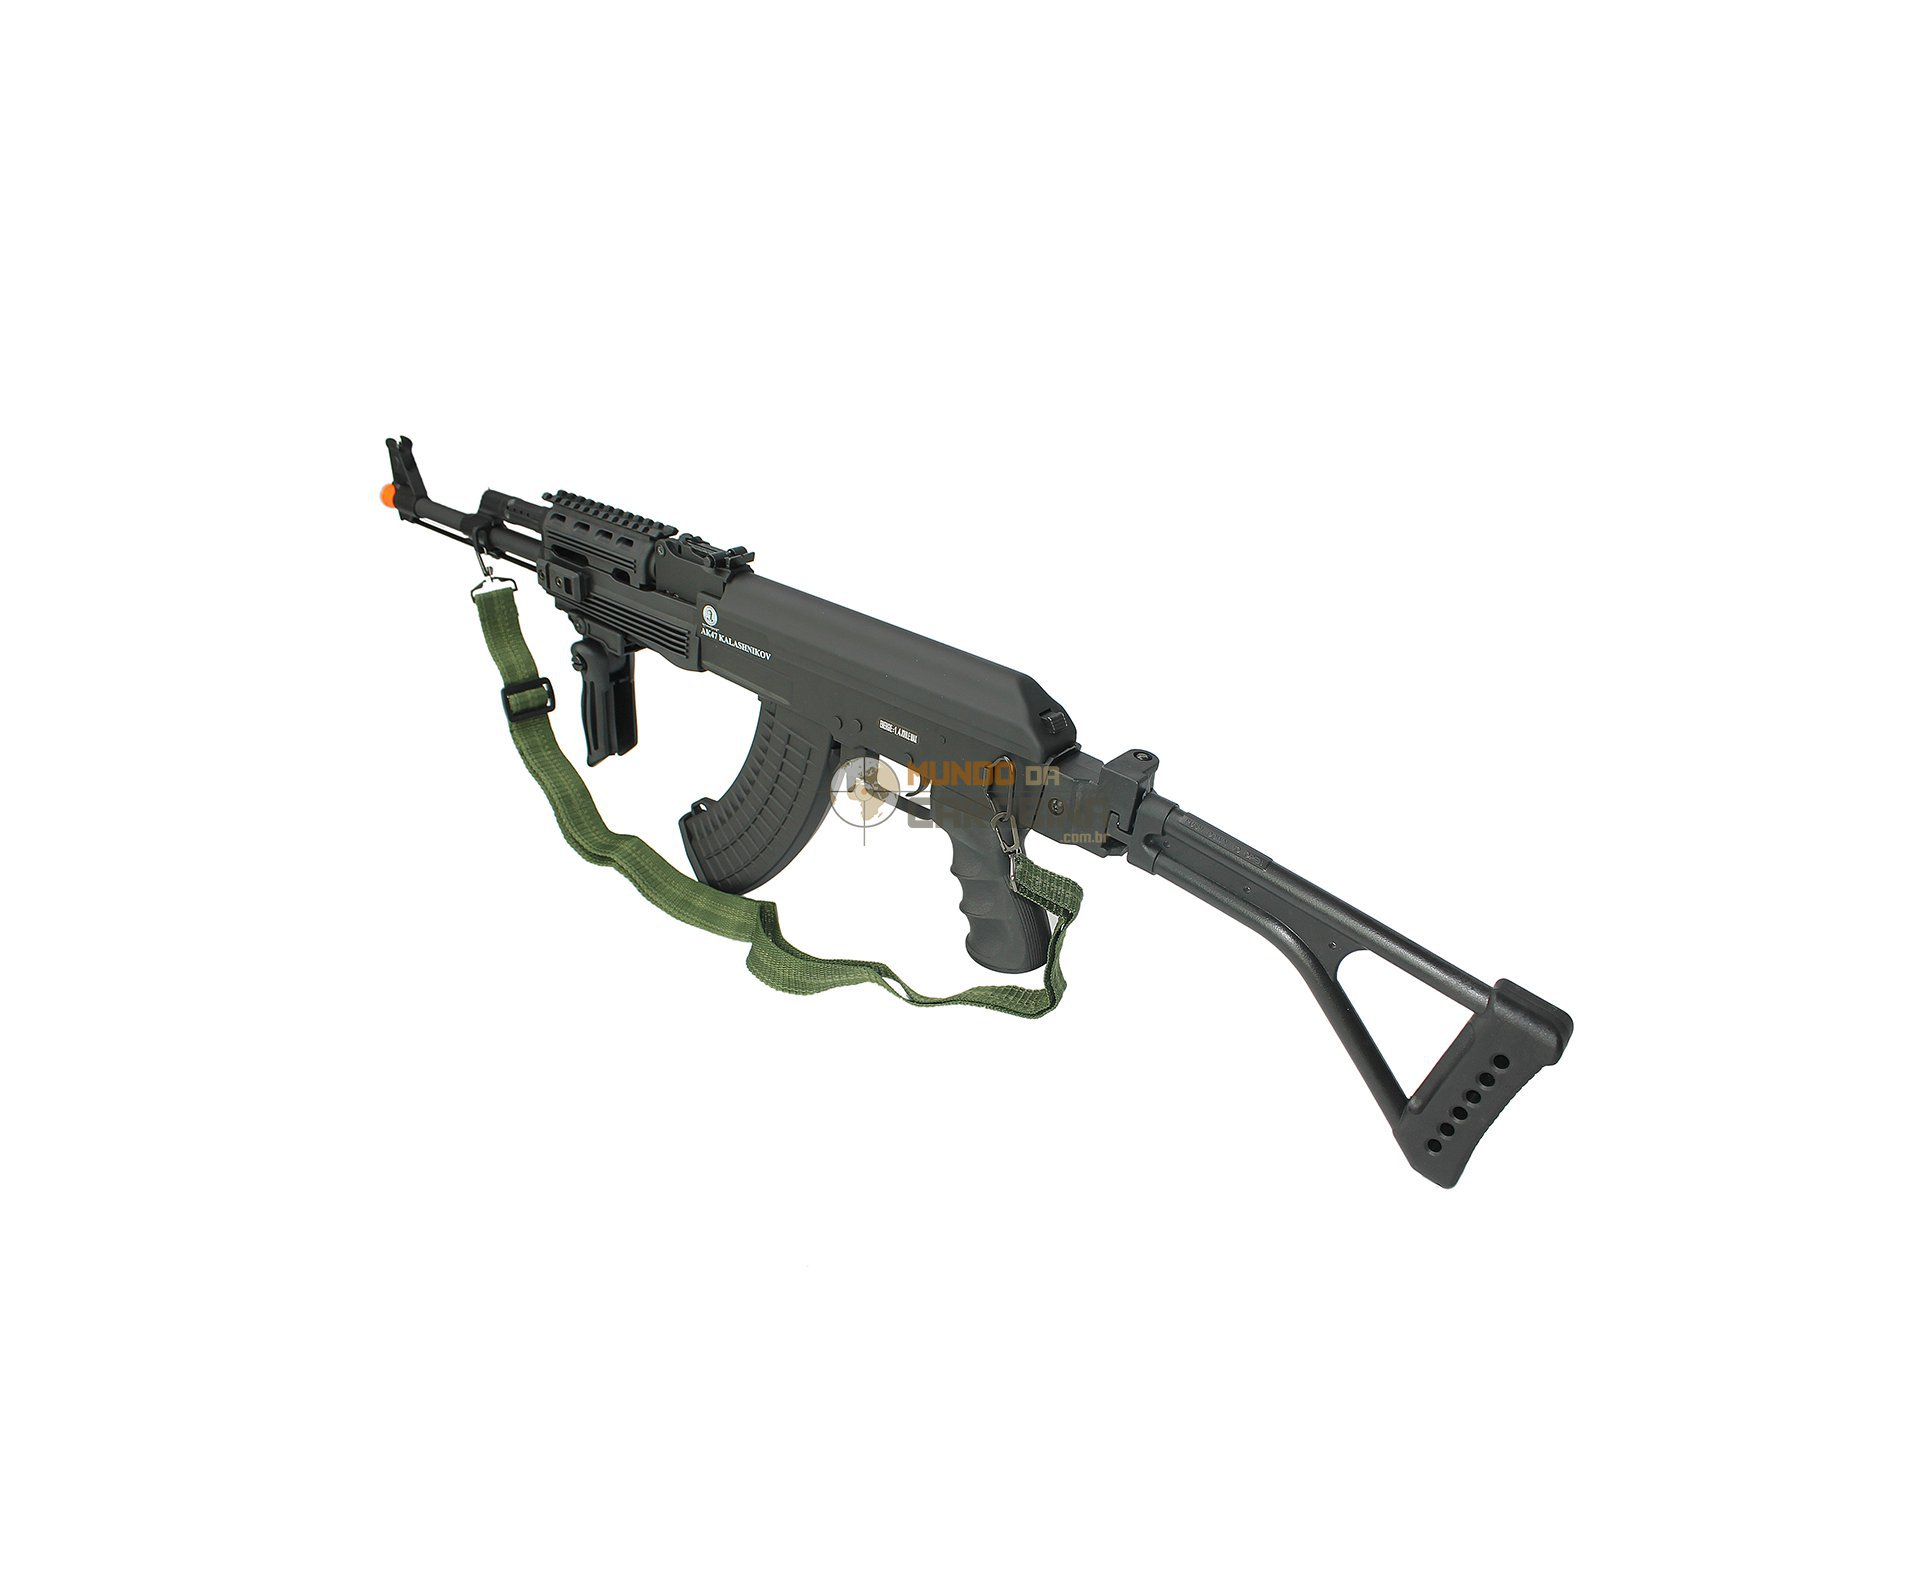 Rifle De Airsoft Ak 47 Tático Semi Metal - Calibre 6,0 Mm - Cyber Gun